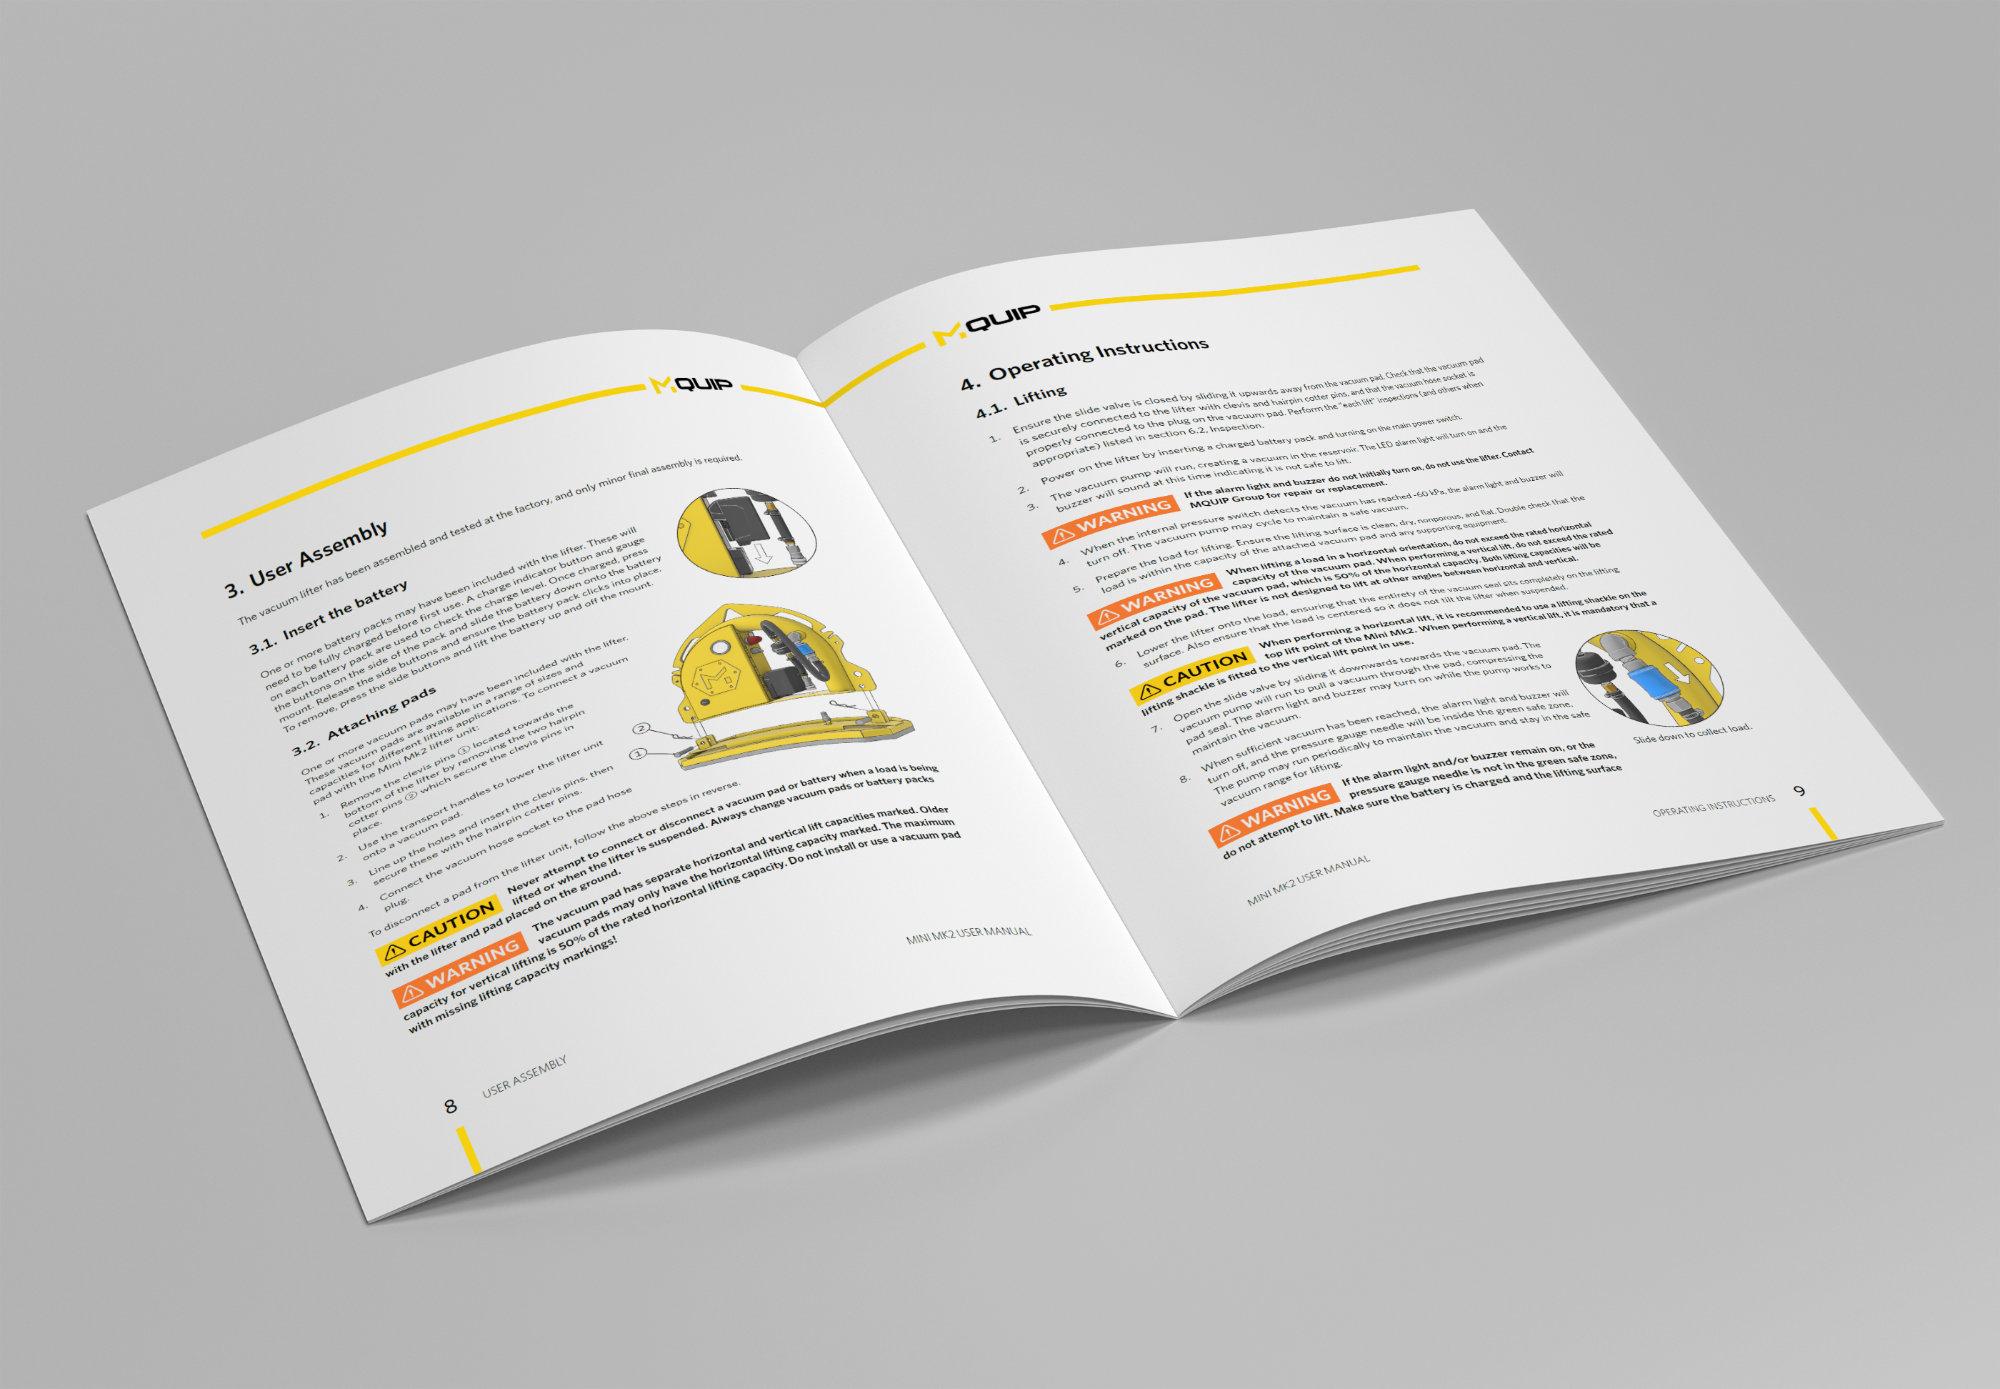 The Mini Mk2 user manual.